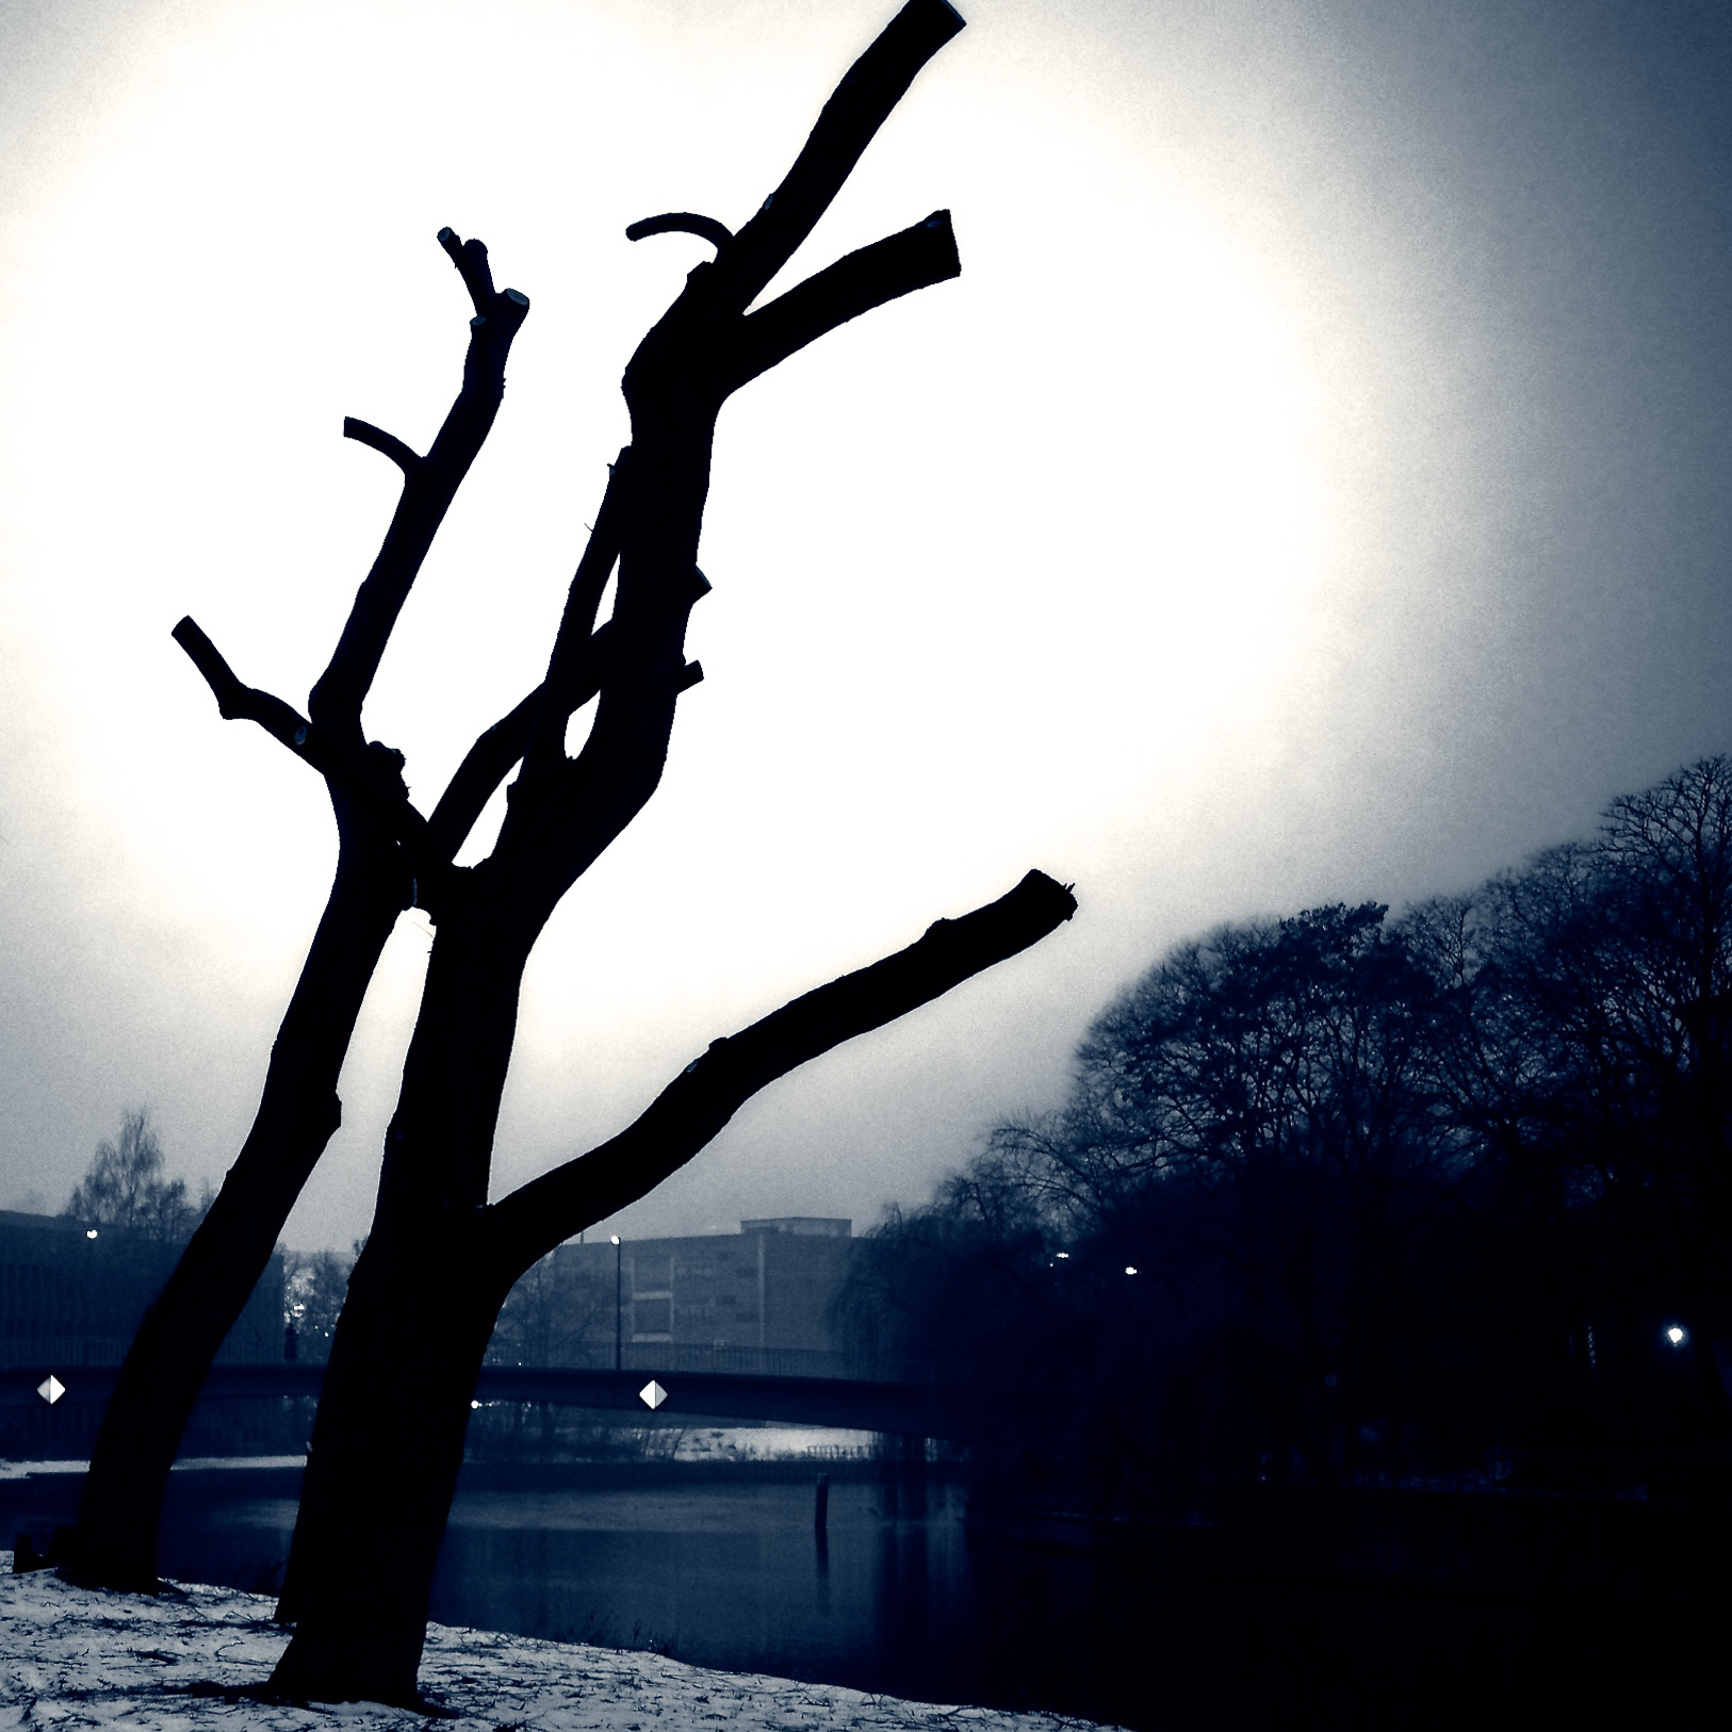 Berlin im Winter, Sonntagssymbolbild